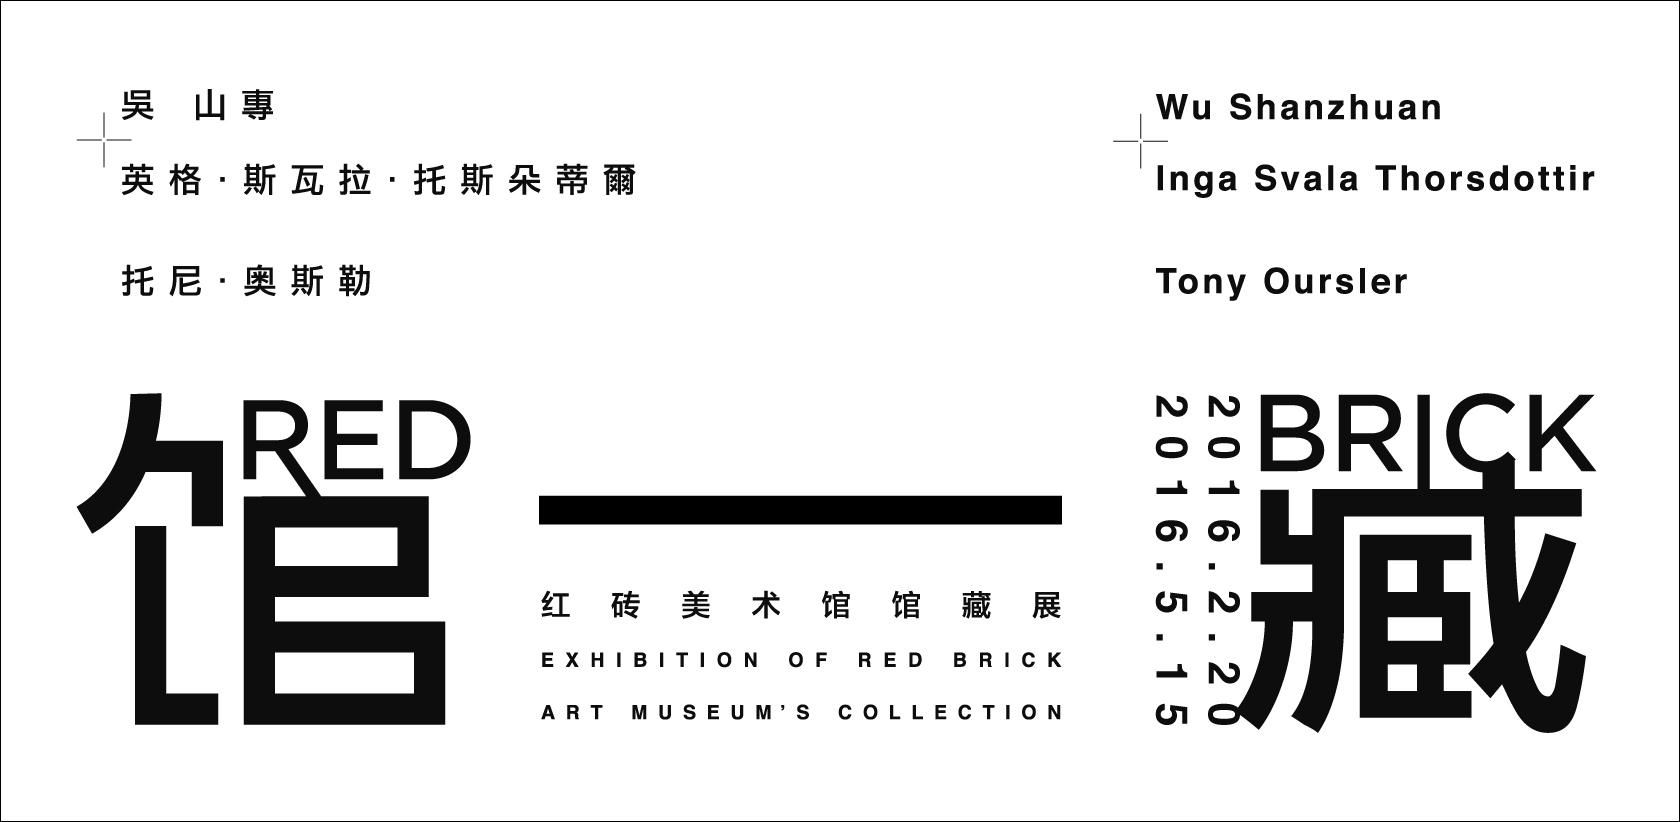 Wu Shanzhuan & Inga Svala Thórsdóttir with Tony Oursler Preface